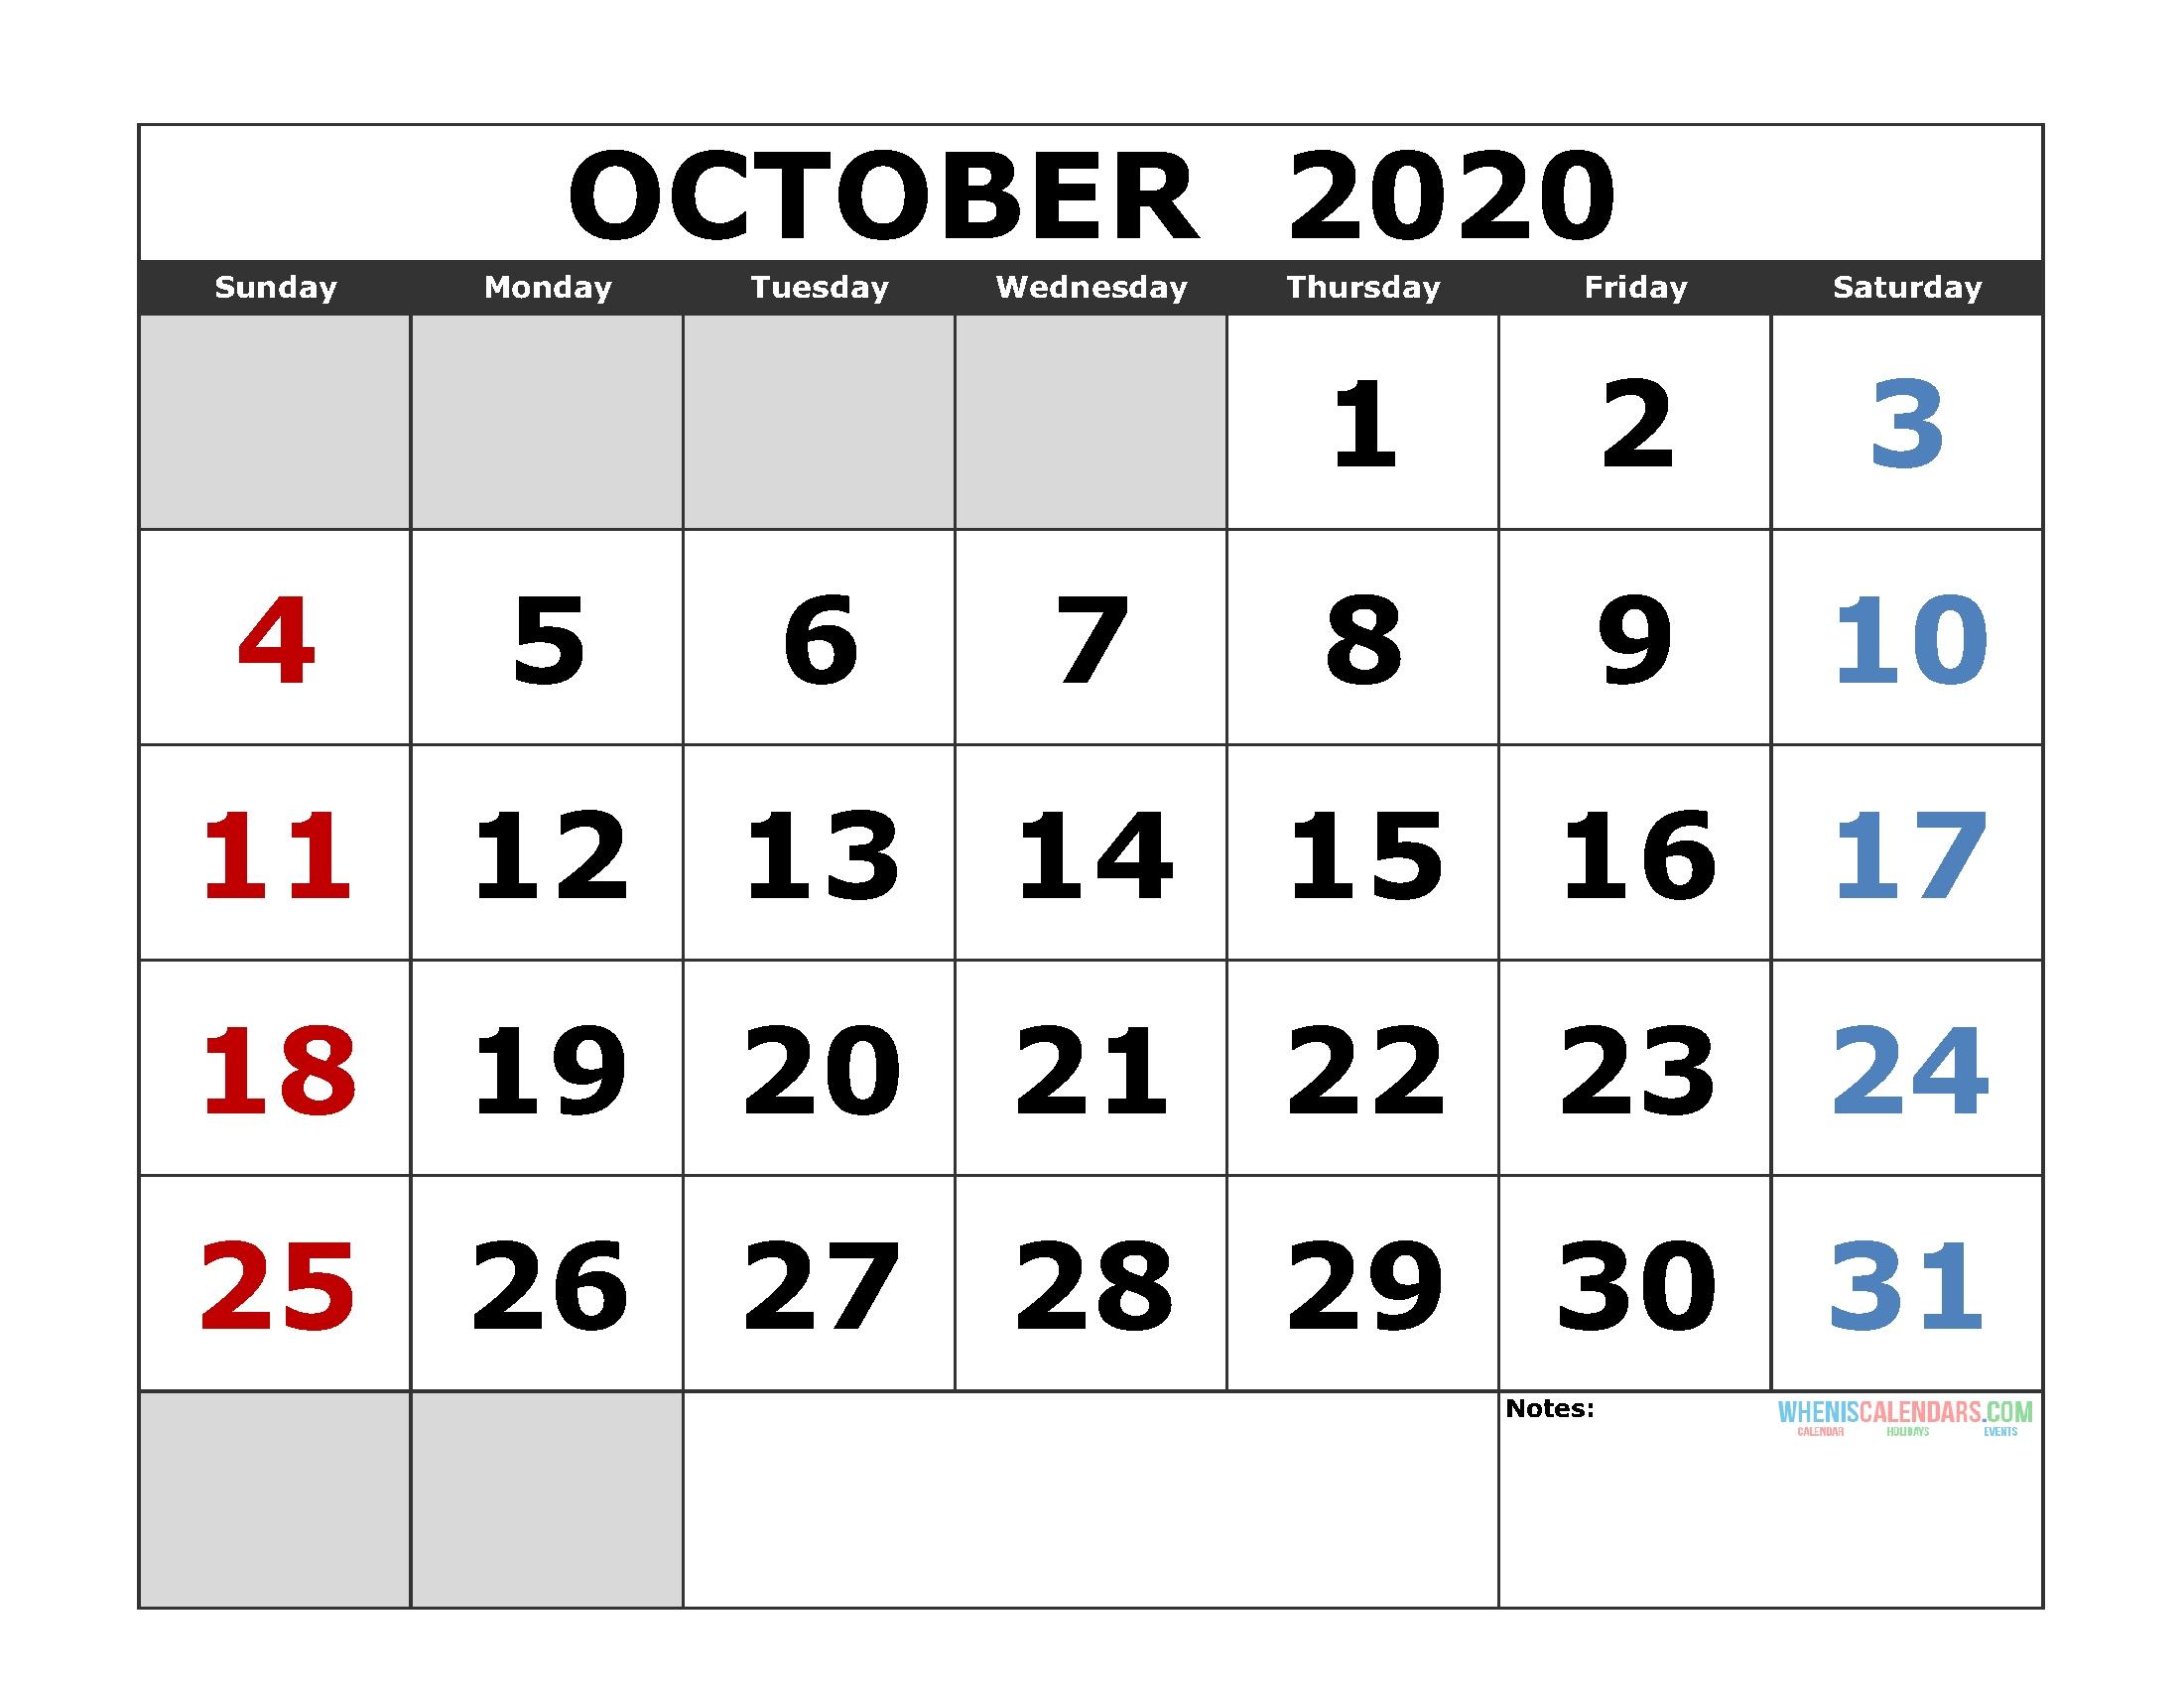 October 2020 Printable Calendar Template Excel, Pdf, Image-Free Printable Blank October 2020 Calendar Jewish Holidays